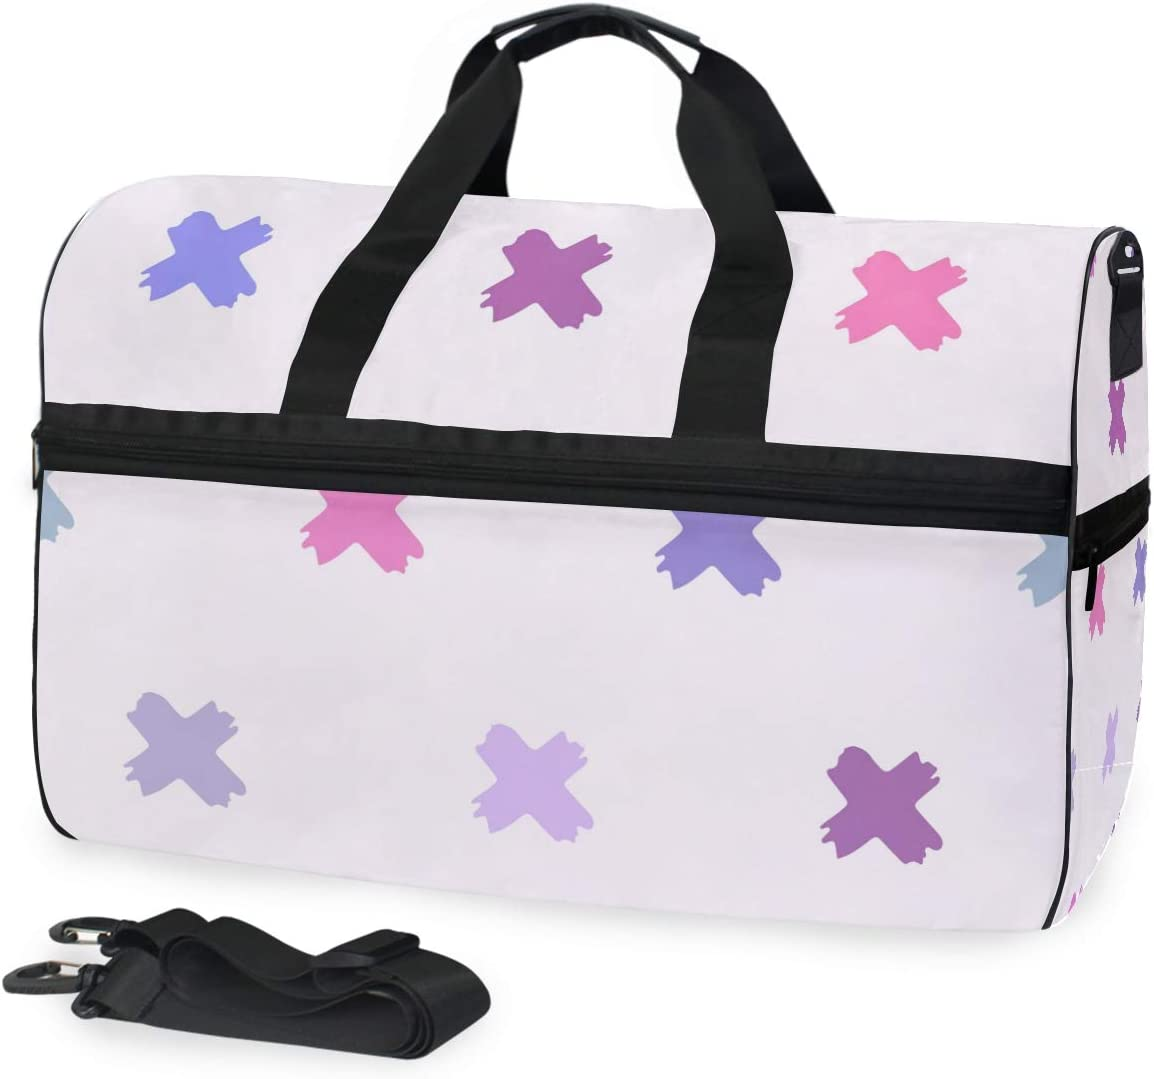 FAJRO Duffle Bag for Women Men Cute Cross Travel Duffel Bag Large Size Water-proof Tear Resistant